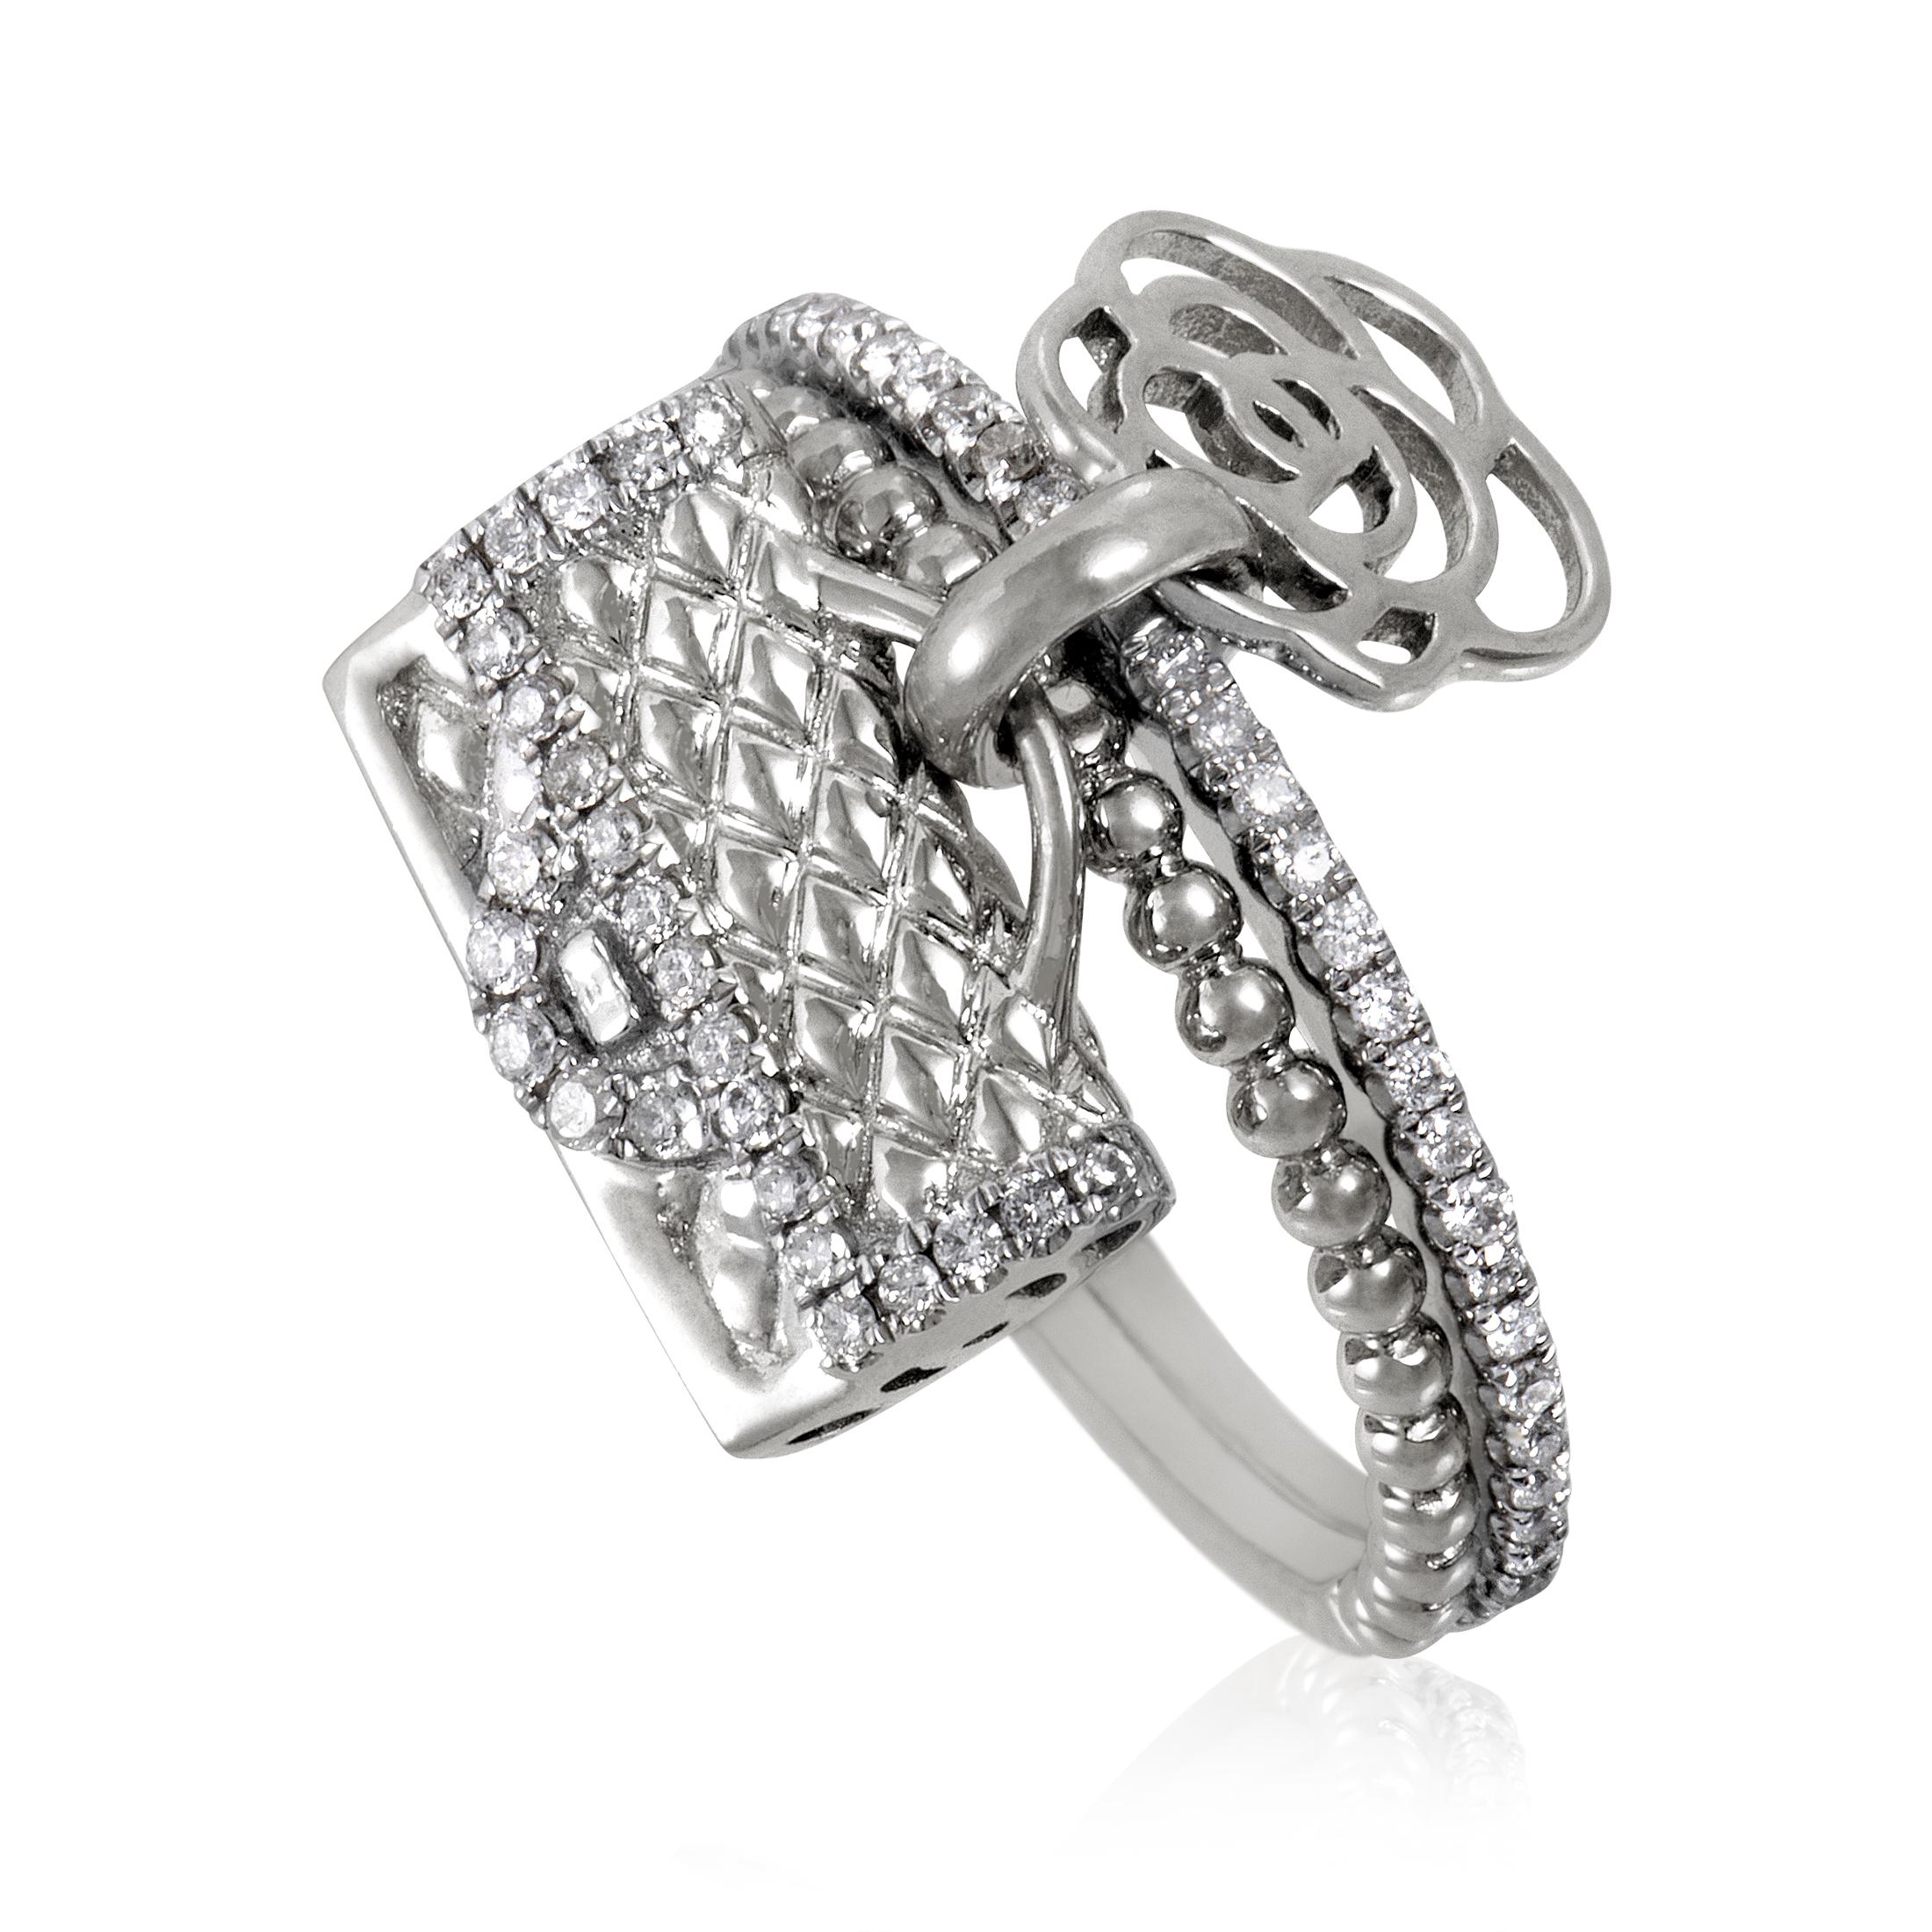 Womens 18K White Gold and Diamond Flower and Handbag Charm Ring